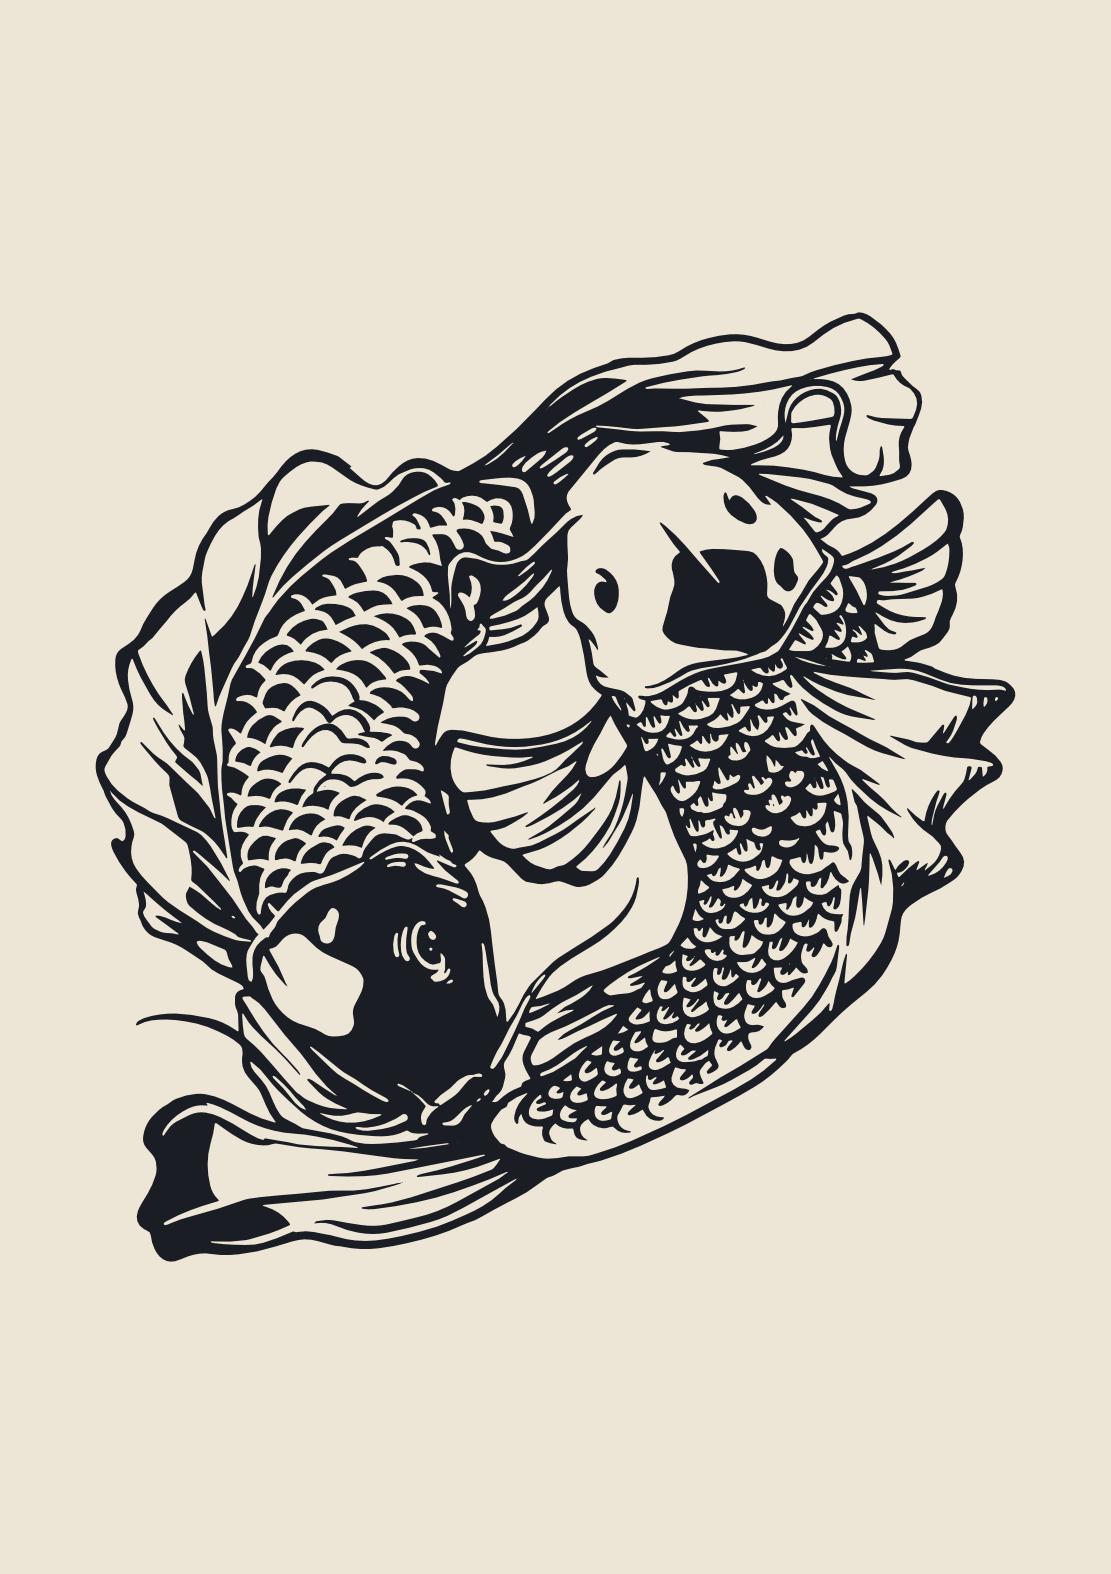 Koi Fish Illustration Yin Yang Poster In 2021 Koi Fish Fish Illustration Yin Yang Koi